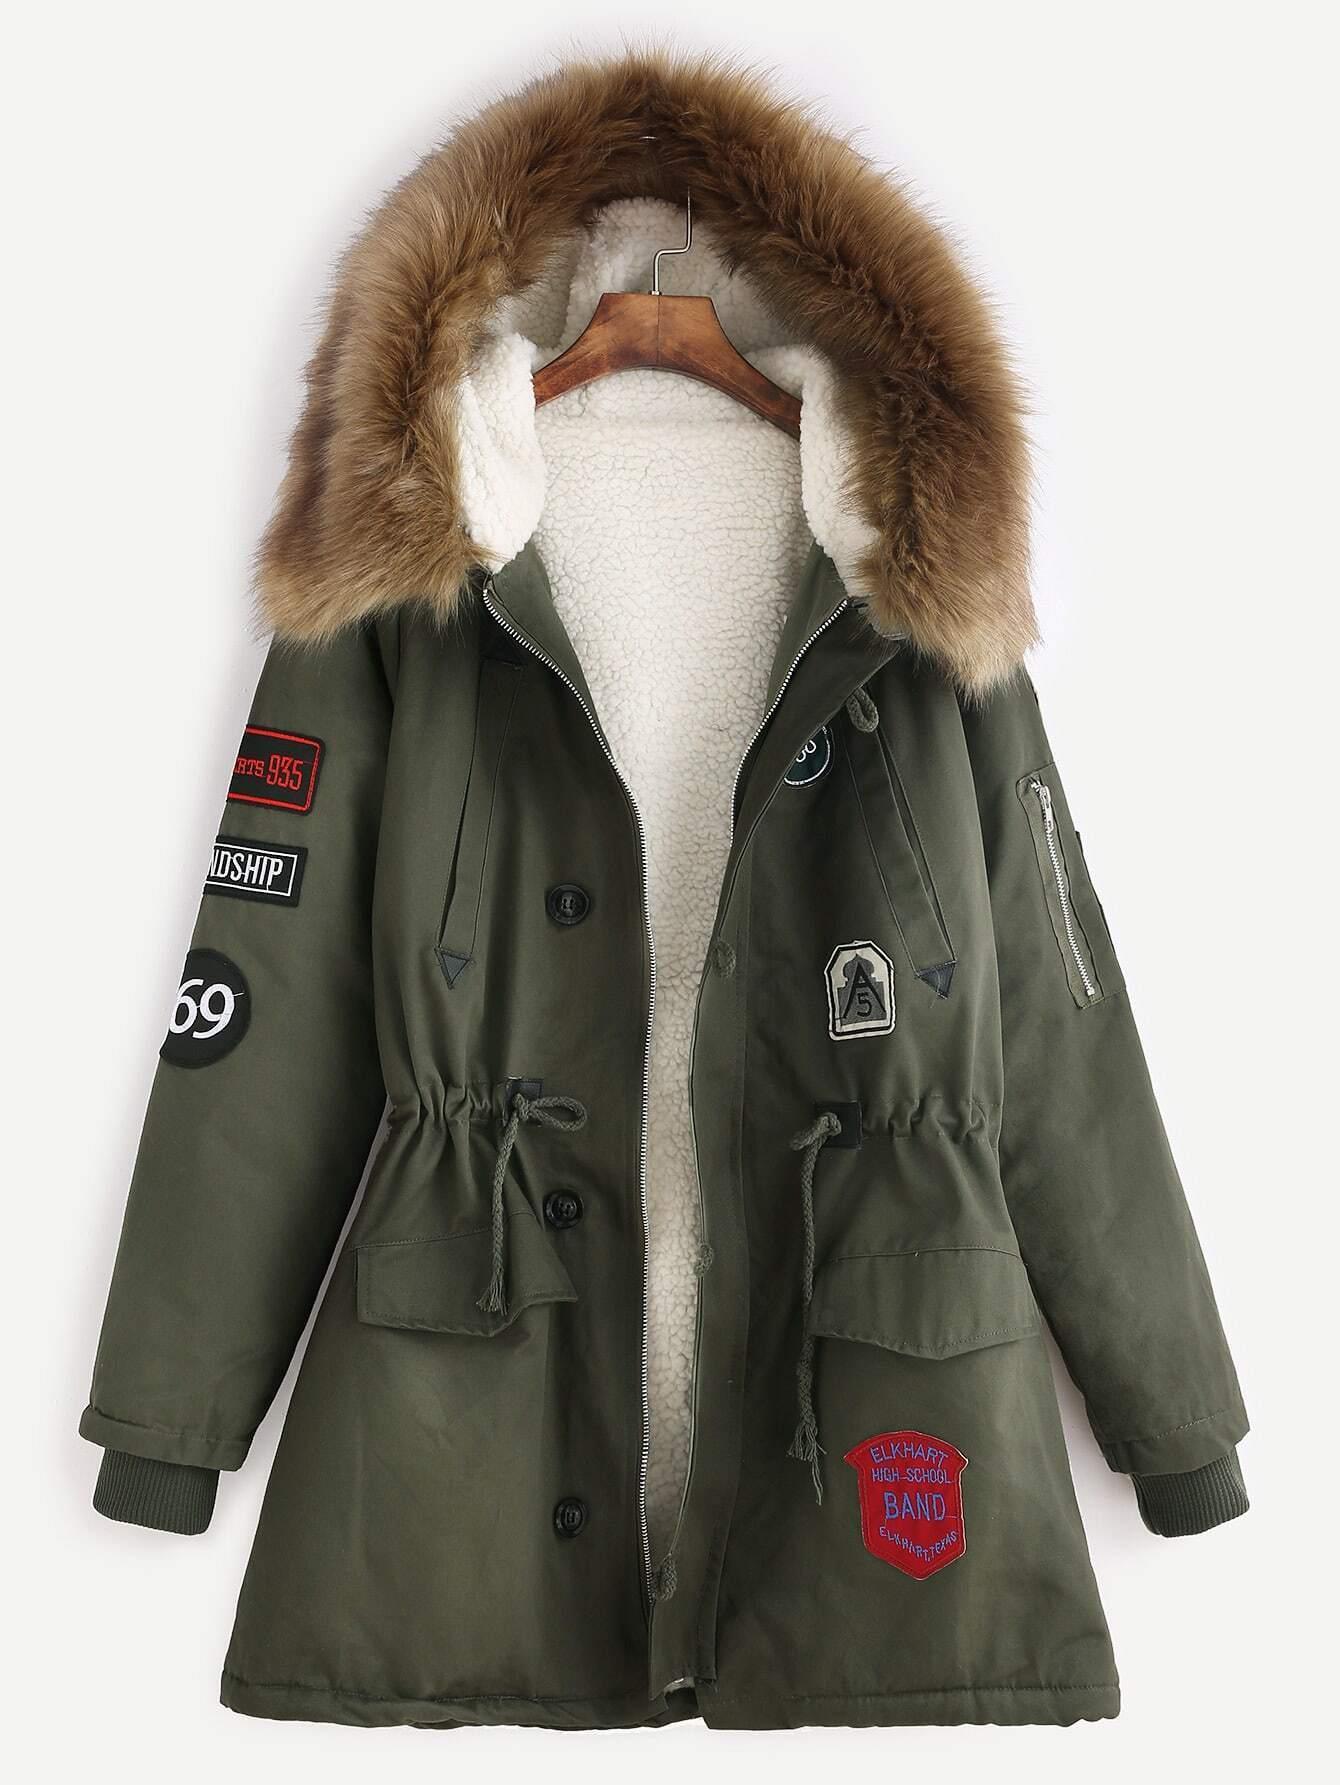 6ef014520dbf1 Army Green Patches Drawstring Hooded Faux Fur Trim Parka EmmaCloth ...